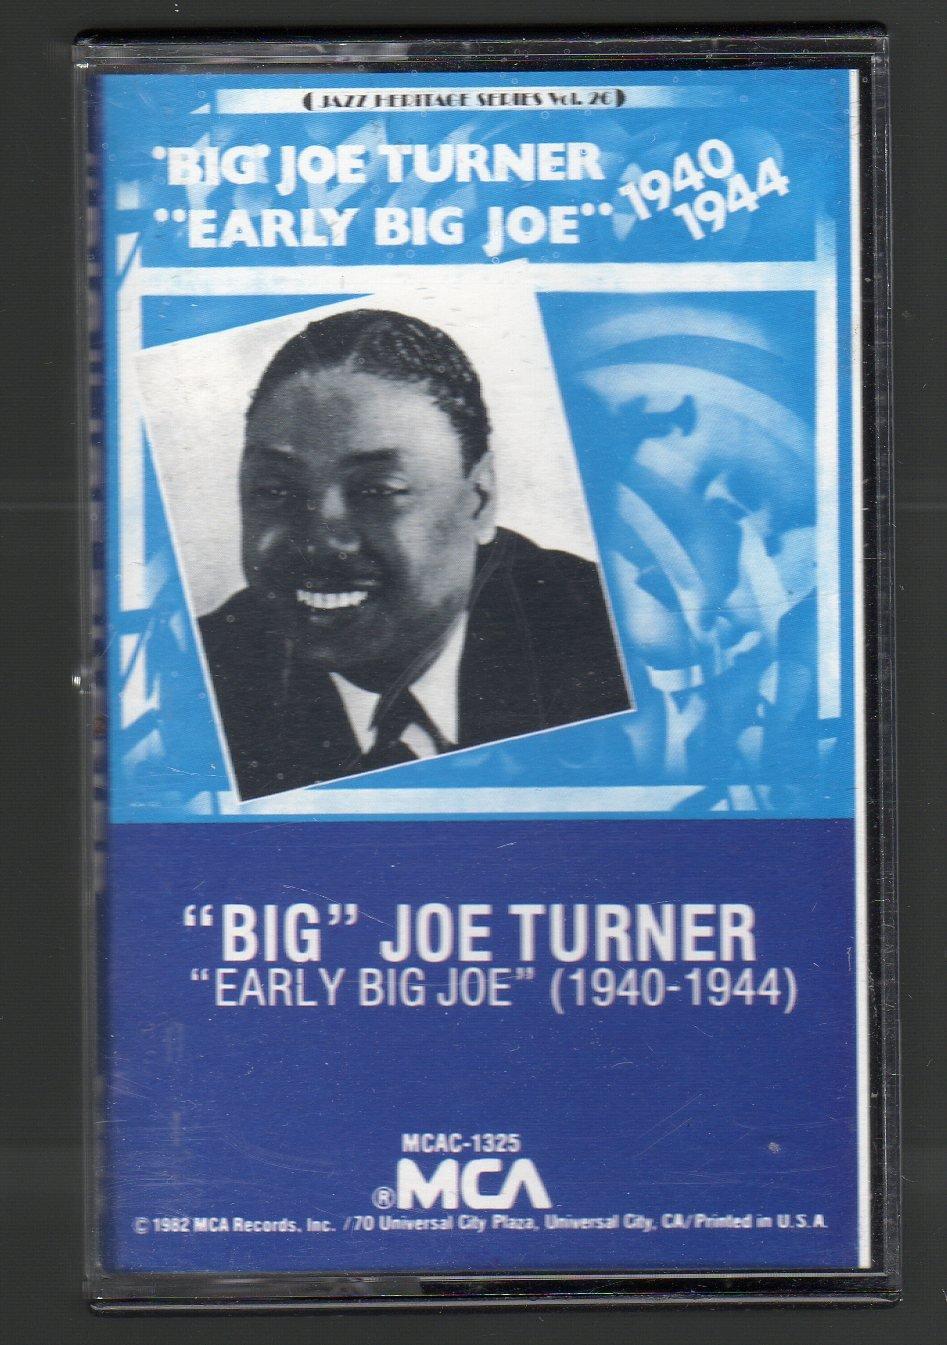 Big Joe Turner - Early Big Joe 1940-1944 RARE Cassette Tape